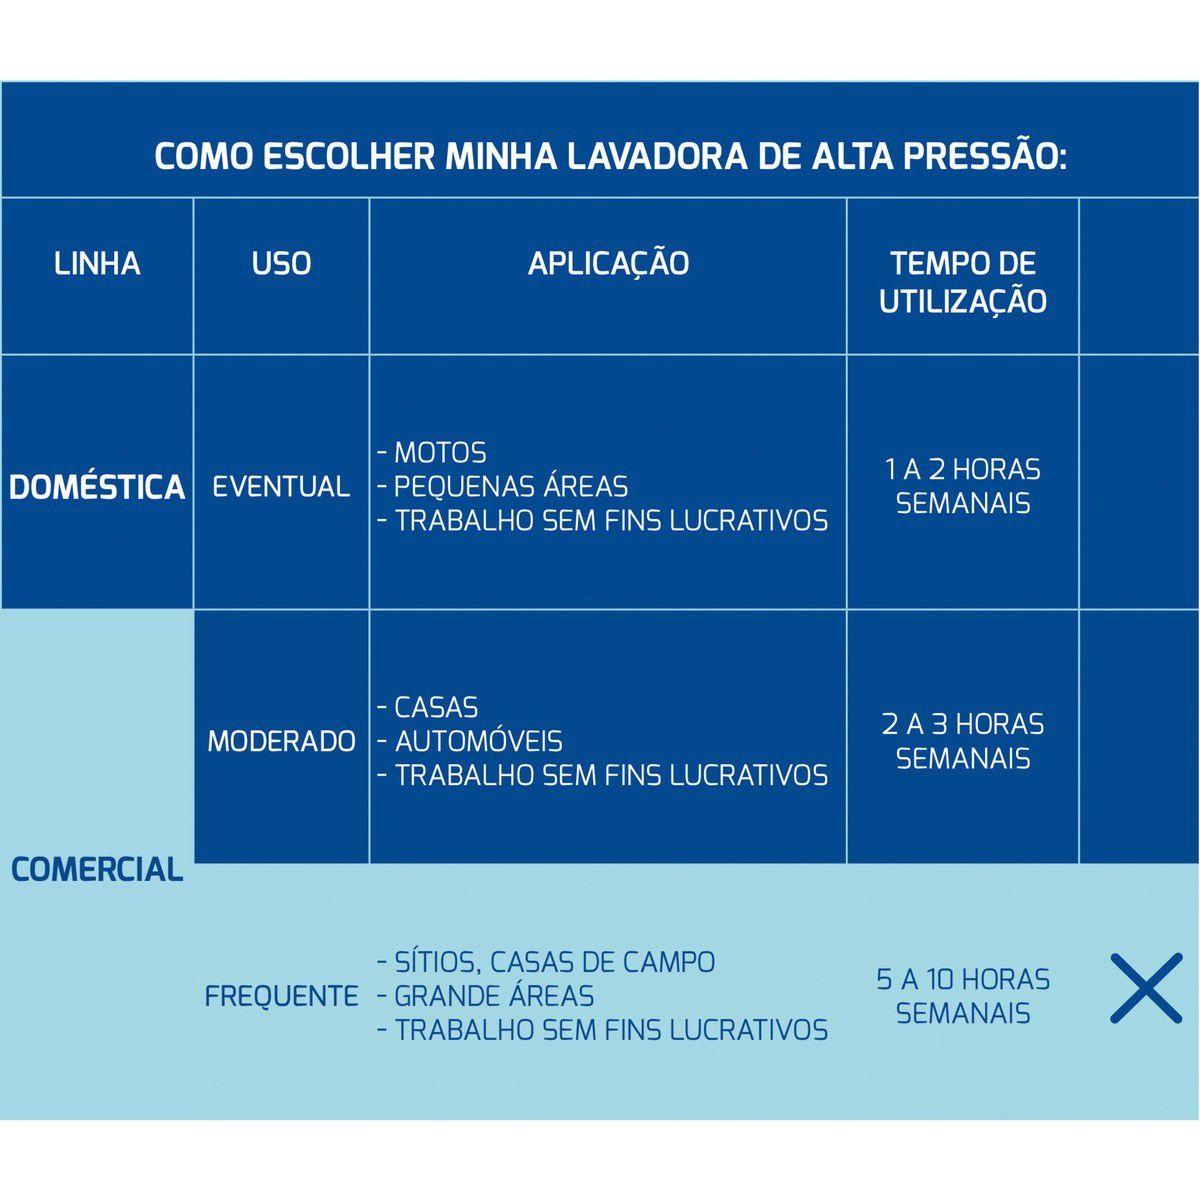 LAVADORA DE ALTA PRESSÃO 2100W 2100Psi Tramontina